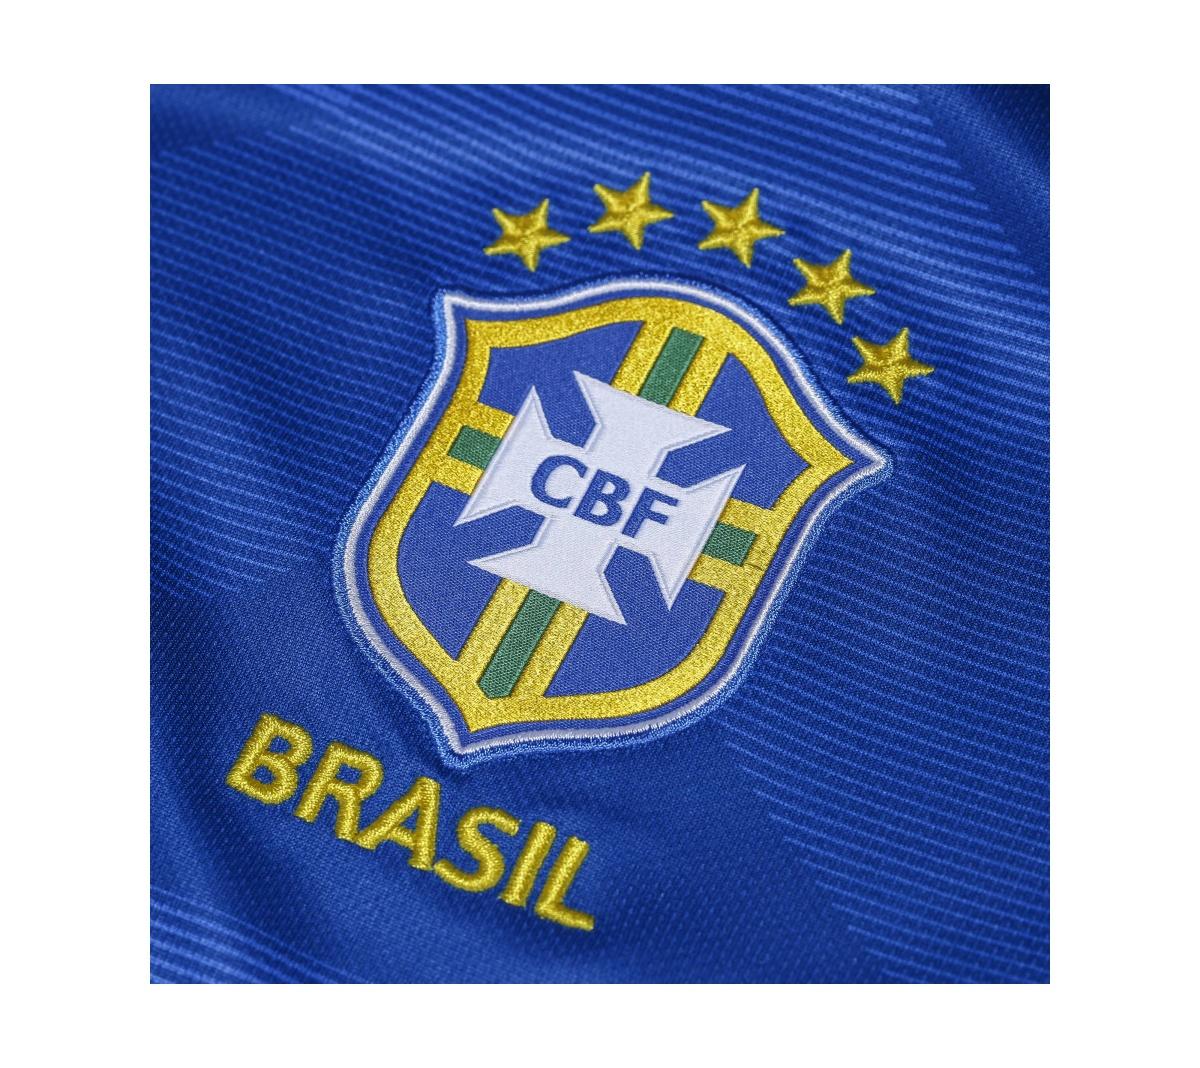 Camisa Nike Brasil II 2018 19 Torcedor Infantil - Mundo do Futebol 8c7deb5ca47